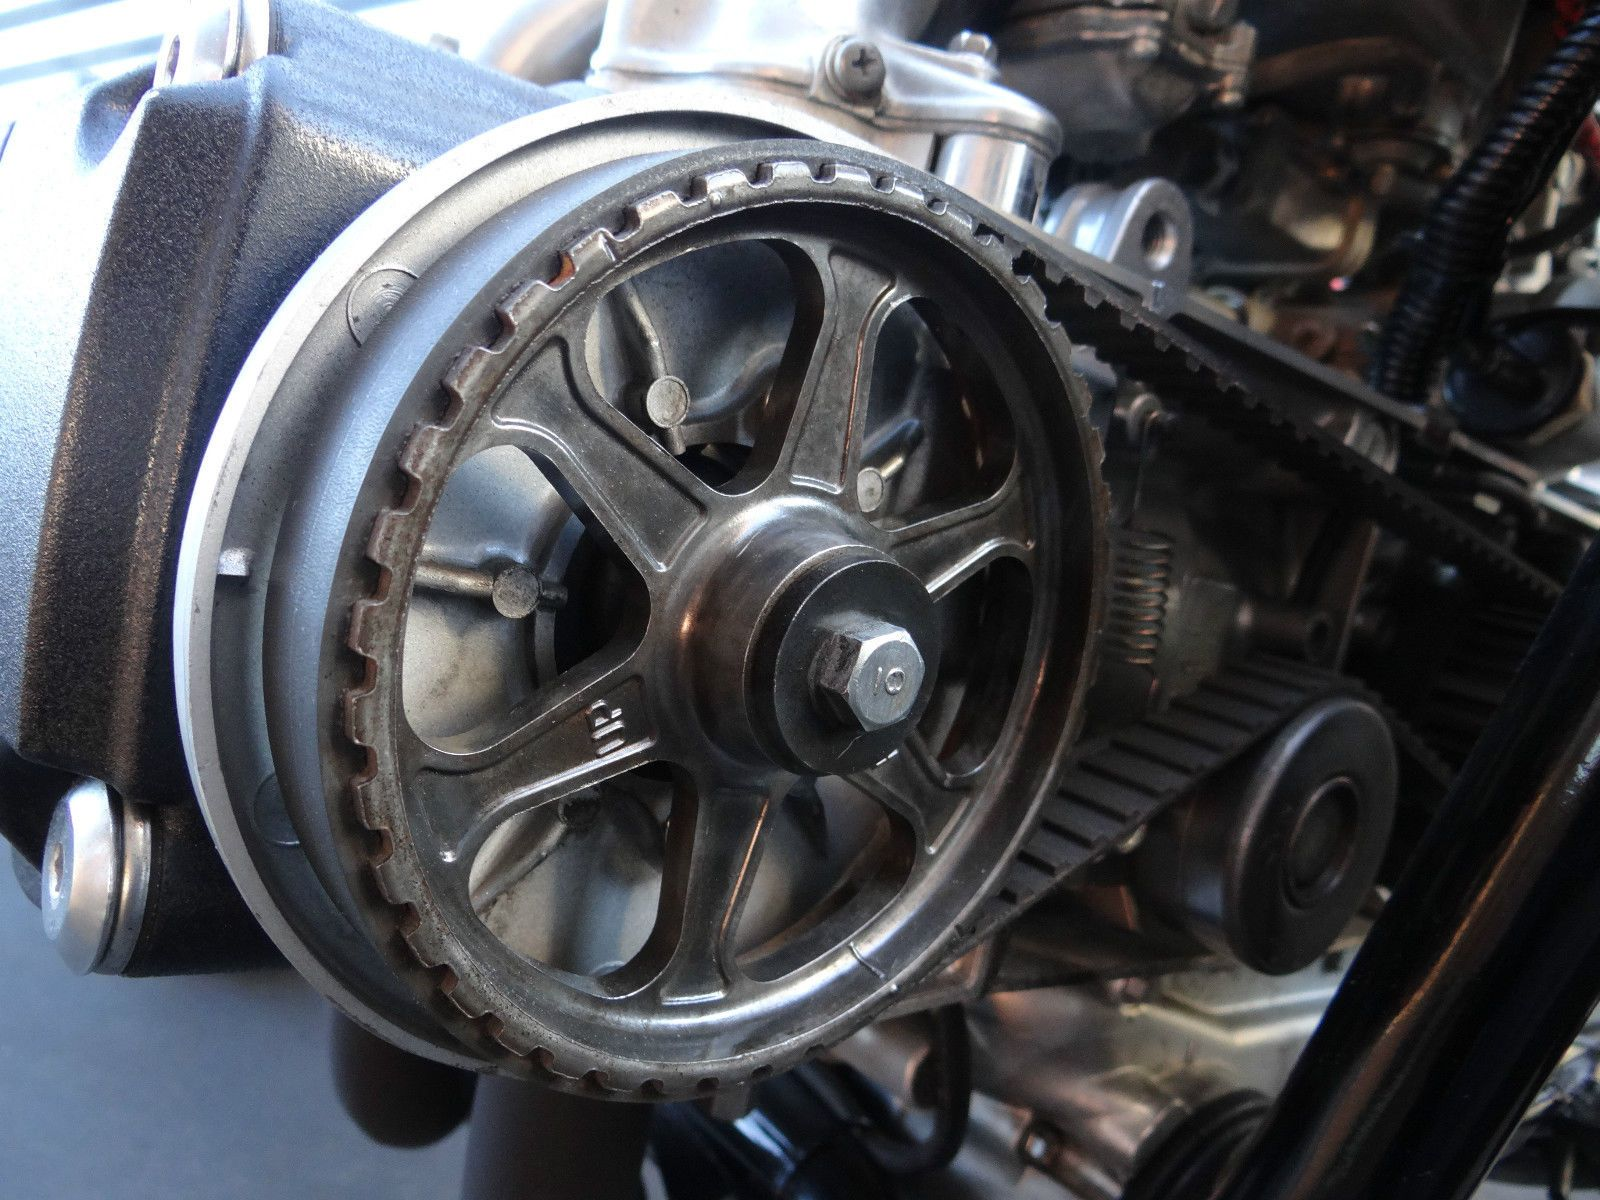 Bobber Cafe Racer Honda Goldwing WAR BIRD